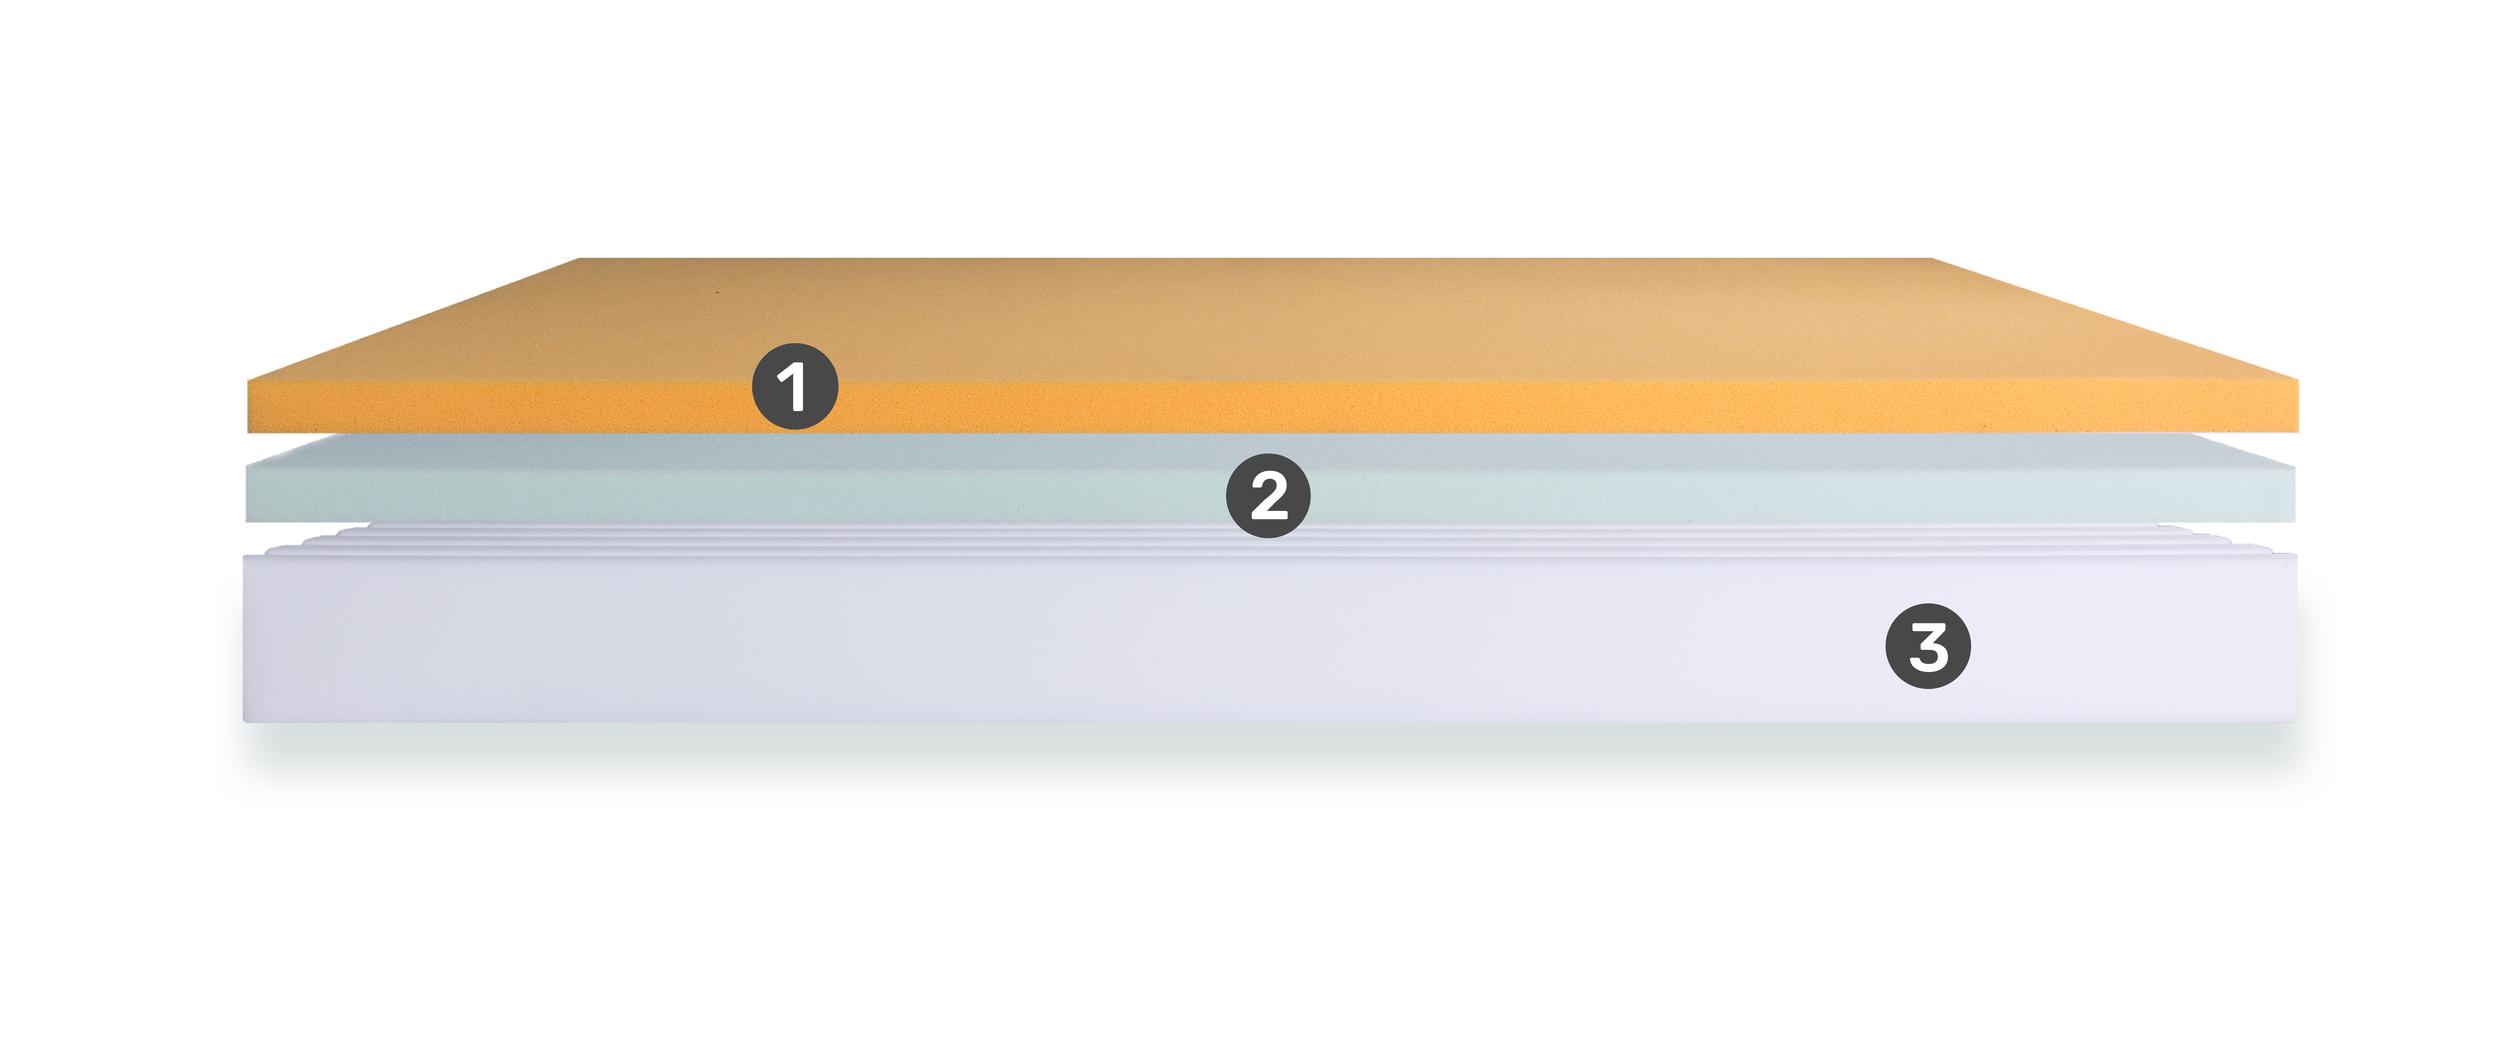 FLEX-18 Diagram (numbers)-01.png